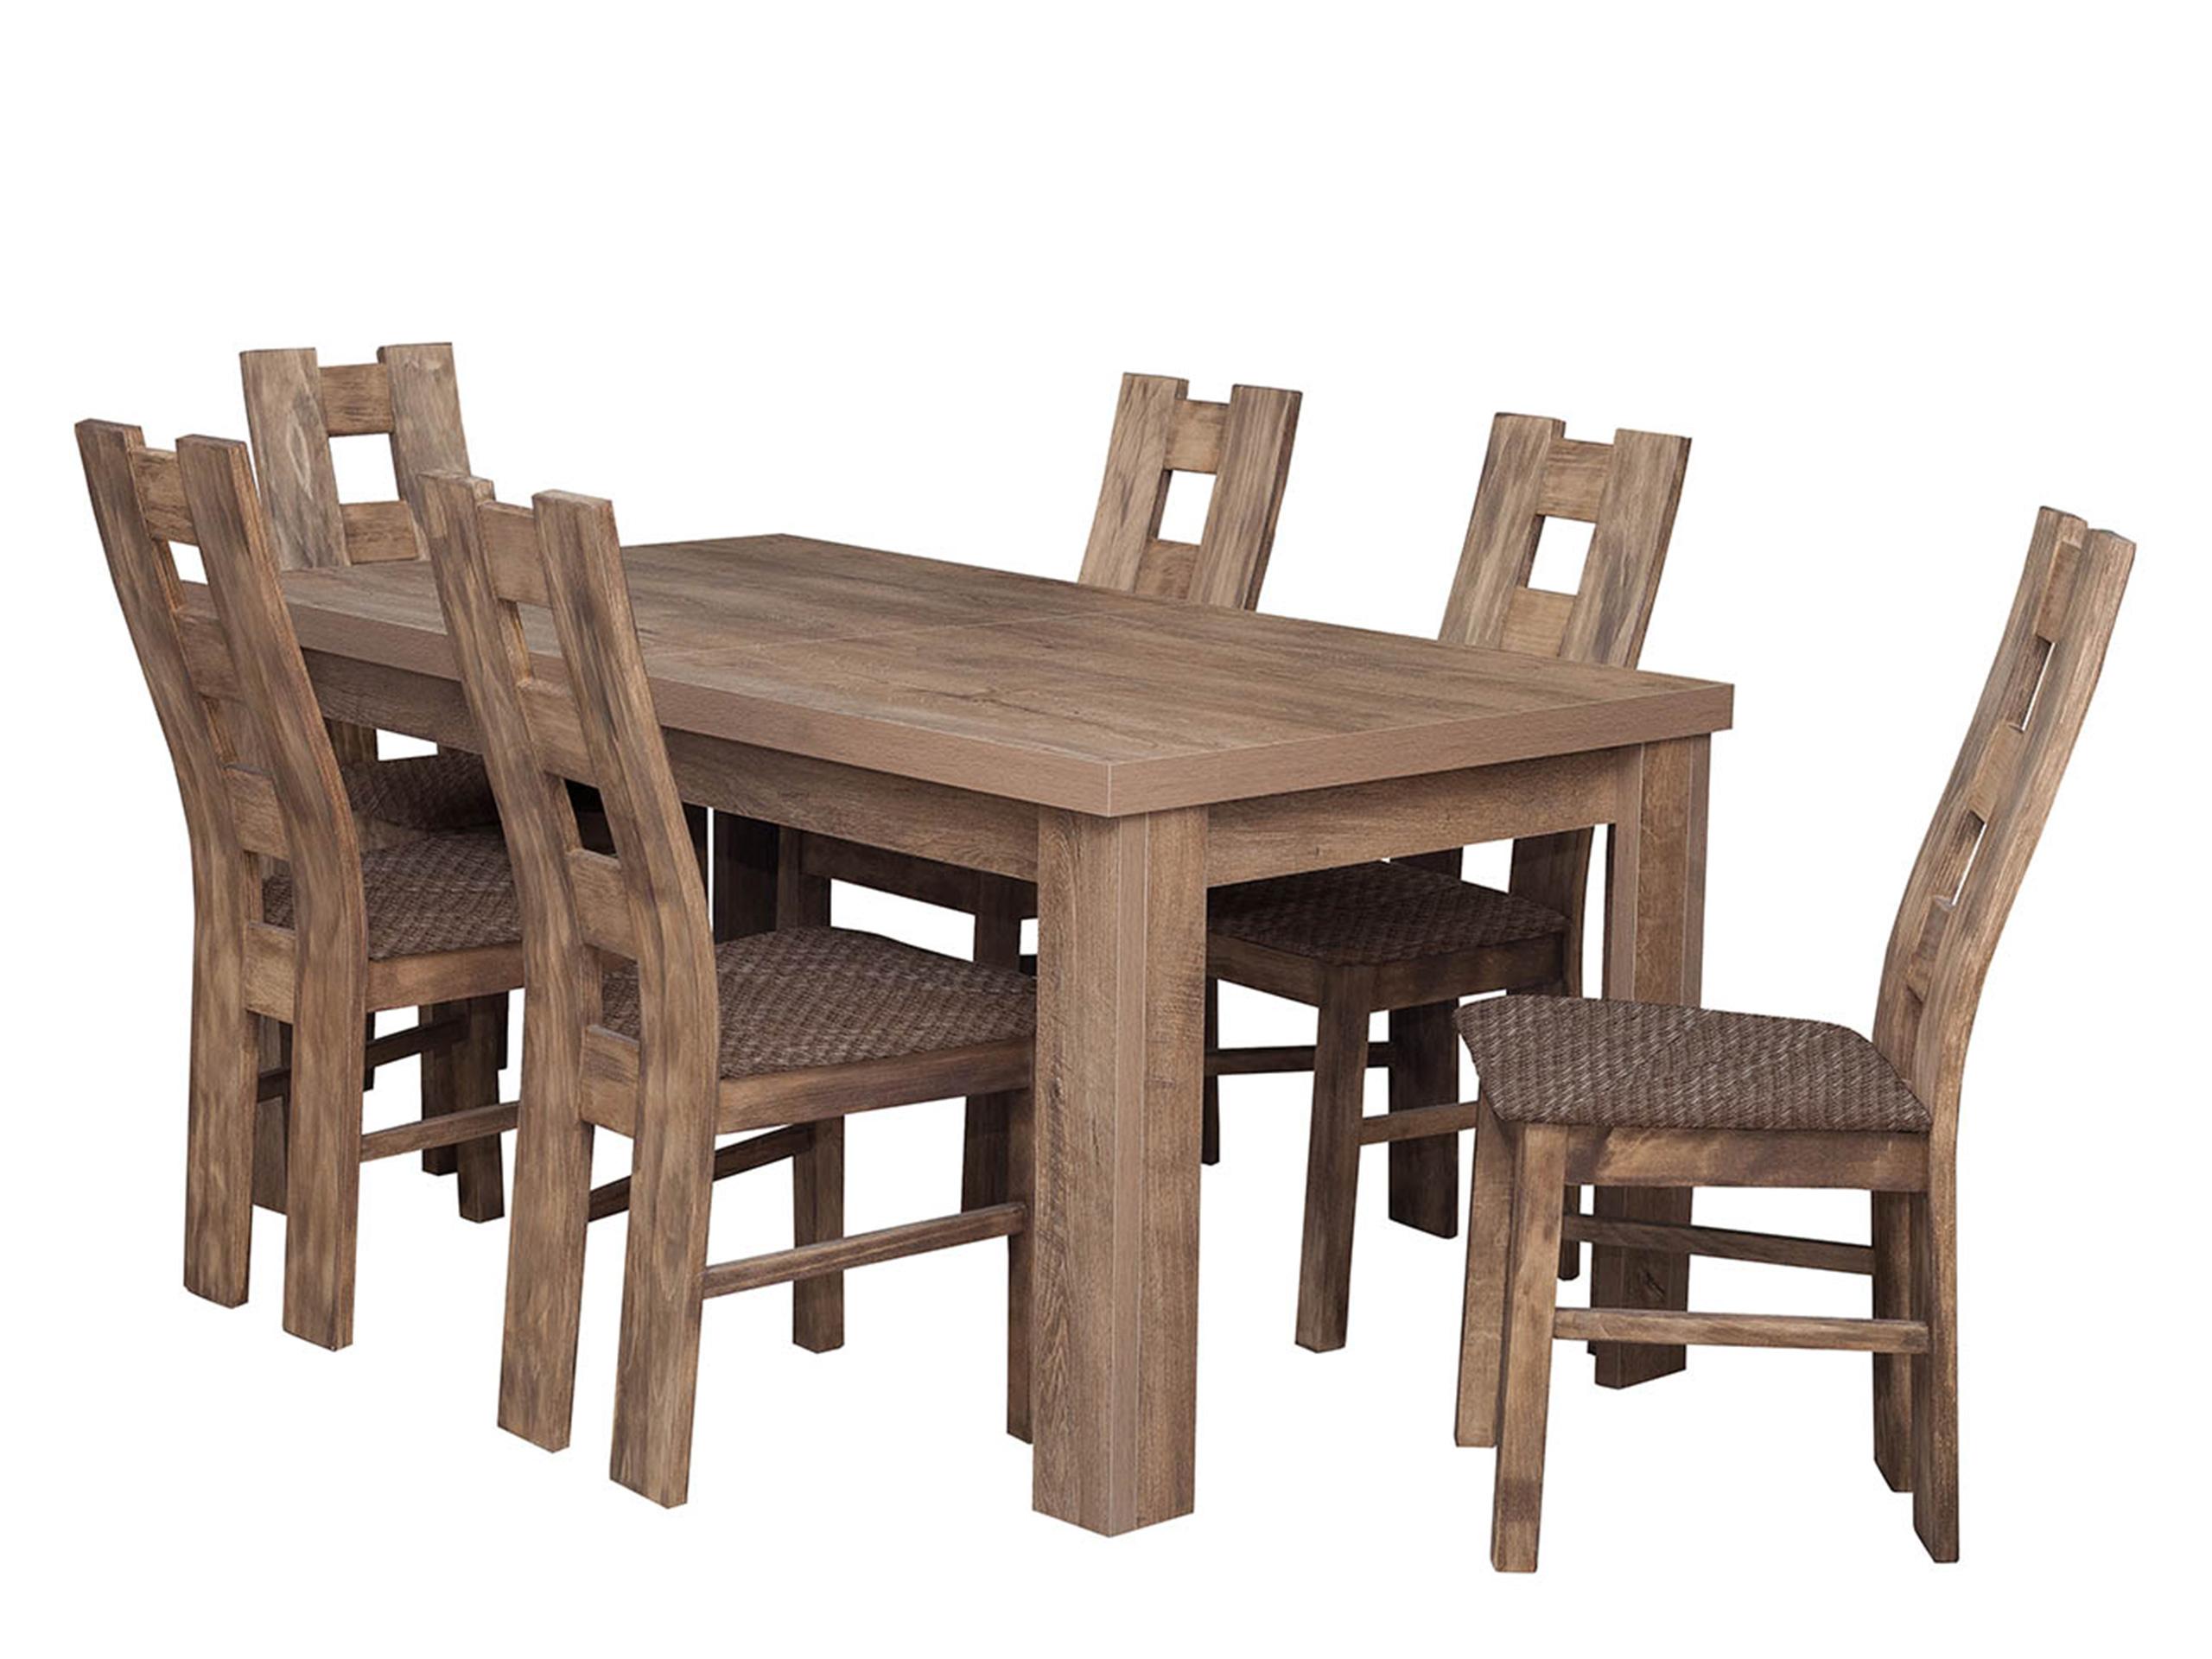 Zestaw Dla 6 Osób Antik Komplet Stół Krzesła 7176267138